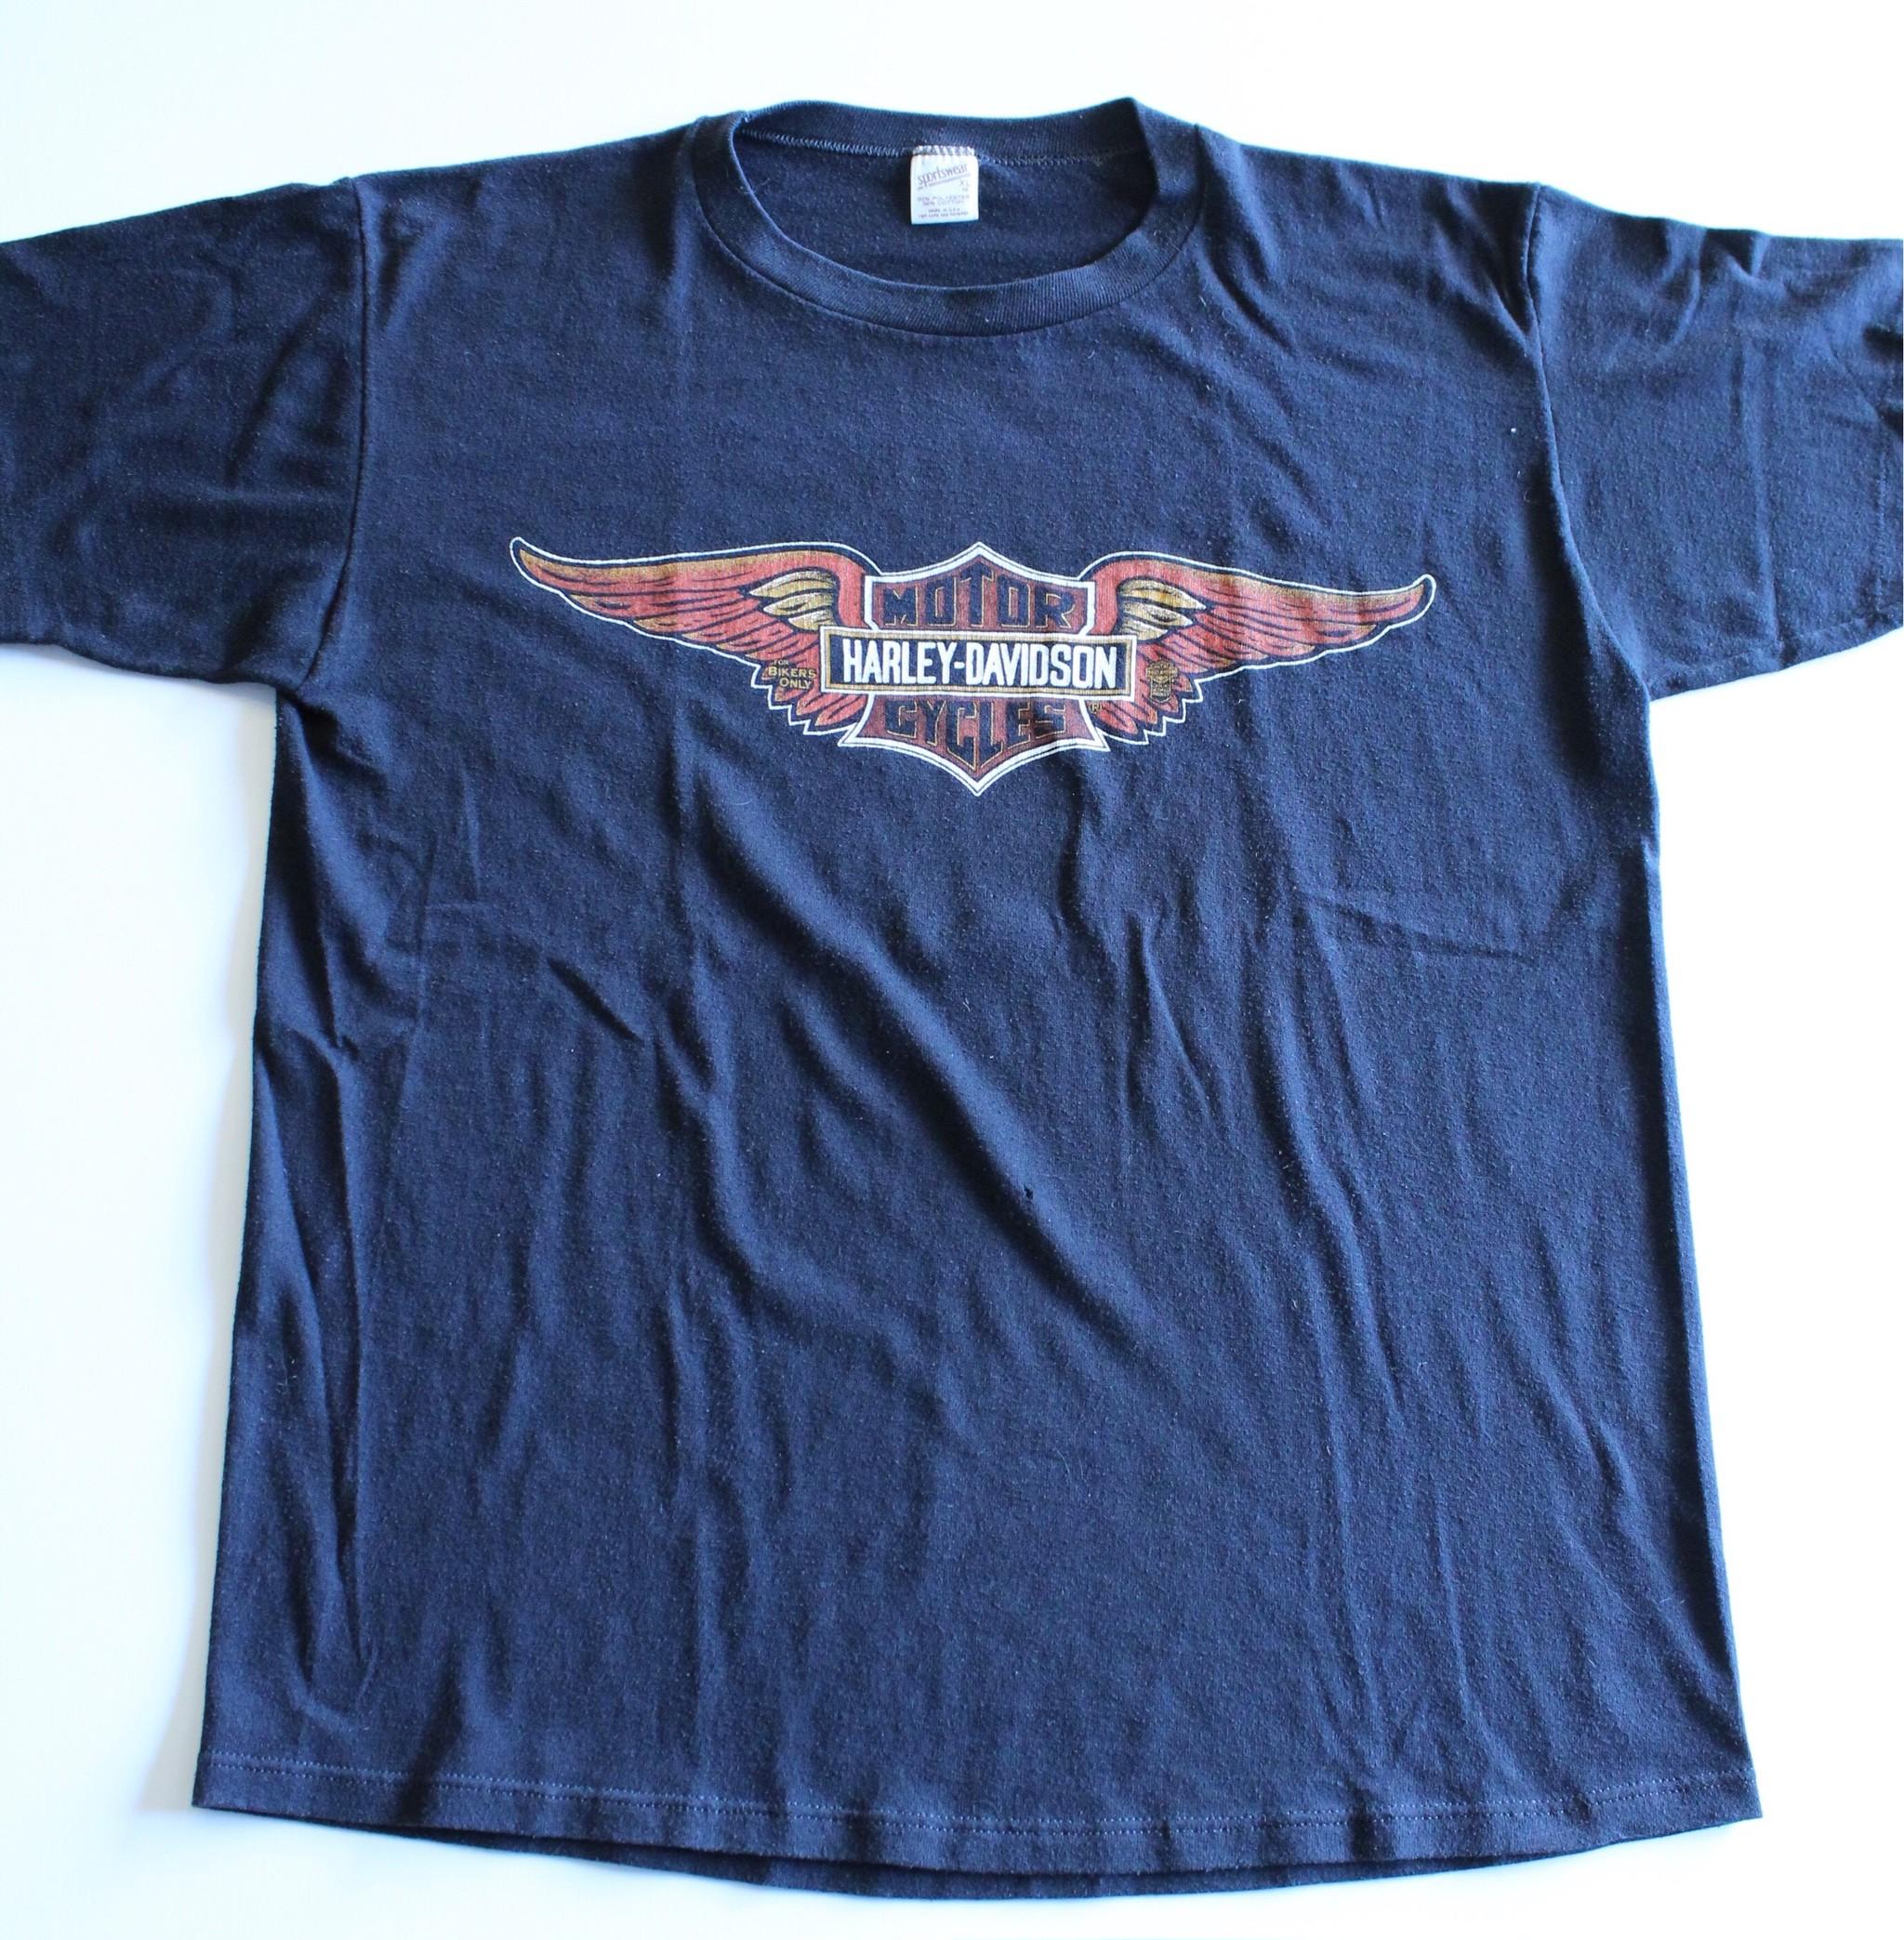 Vintage Harley Davidson T-shirts